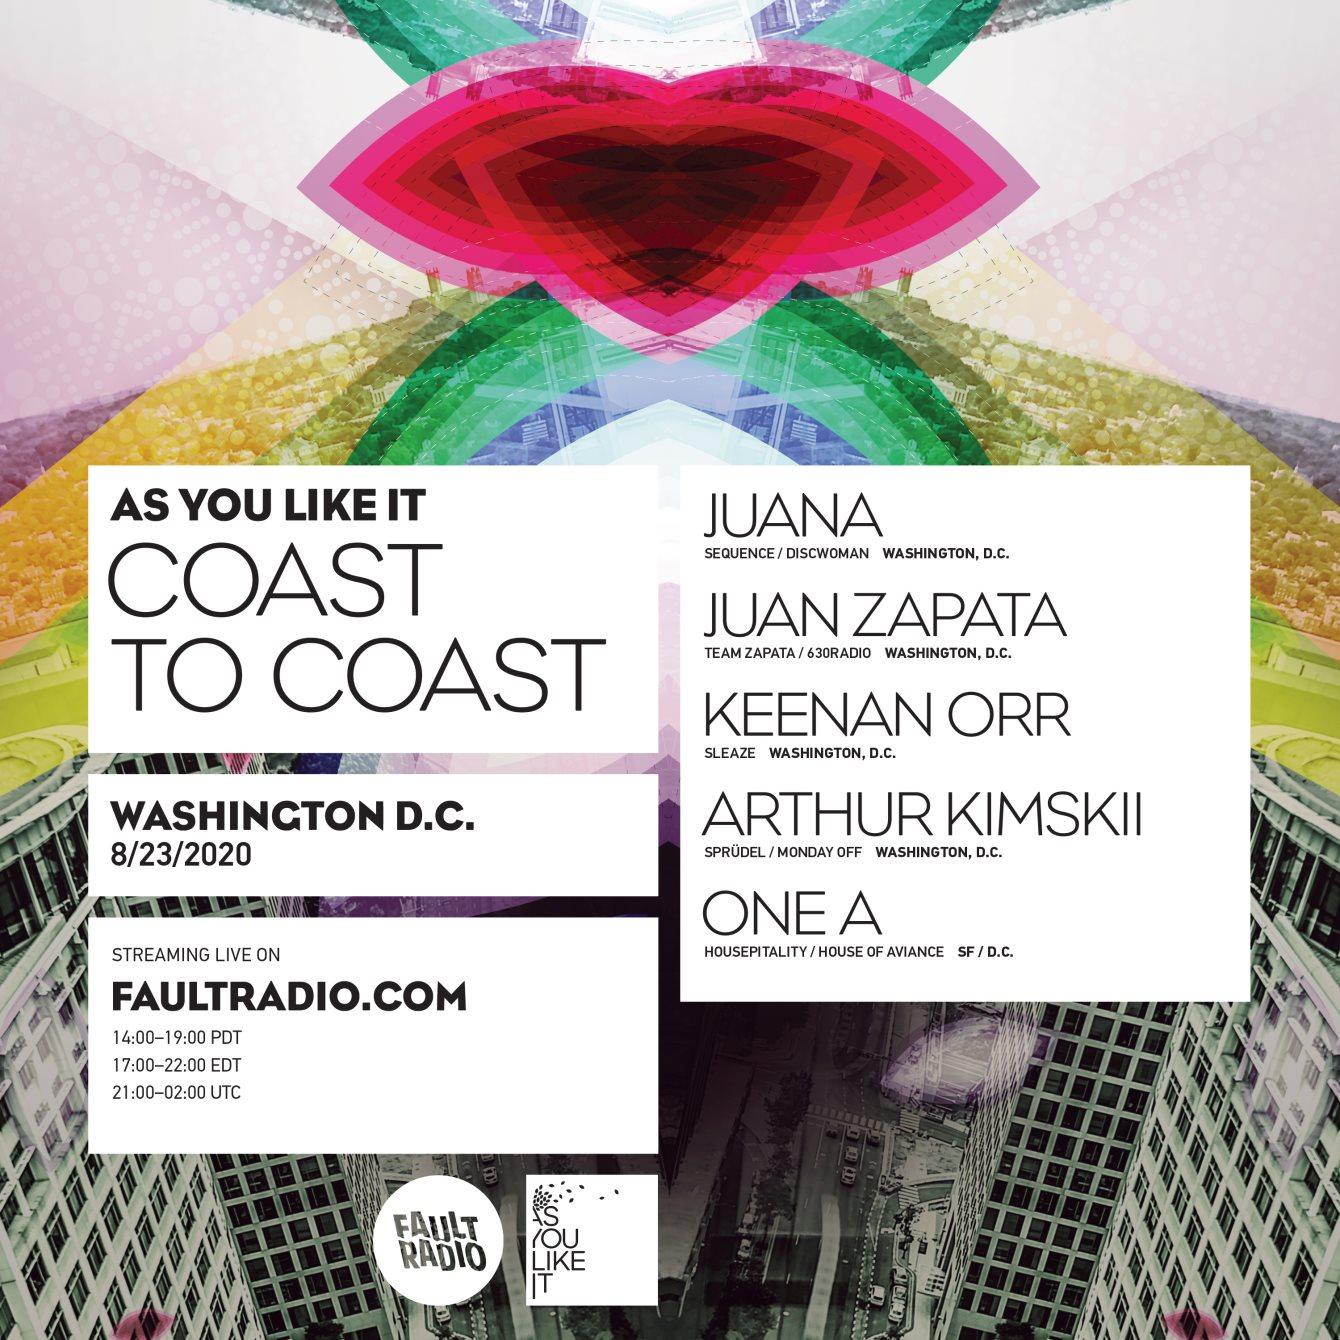 As You Like It Coast to Coast: Washington, D.C - Flyer front